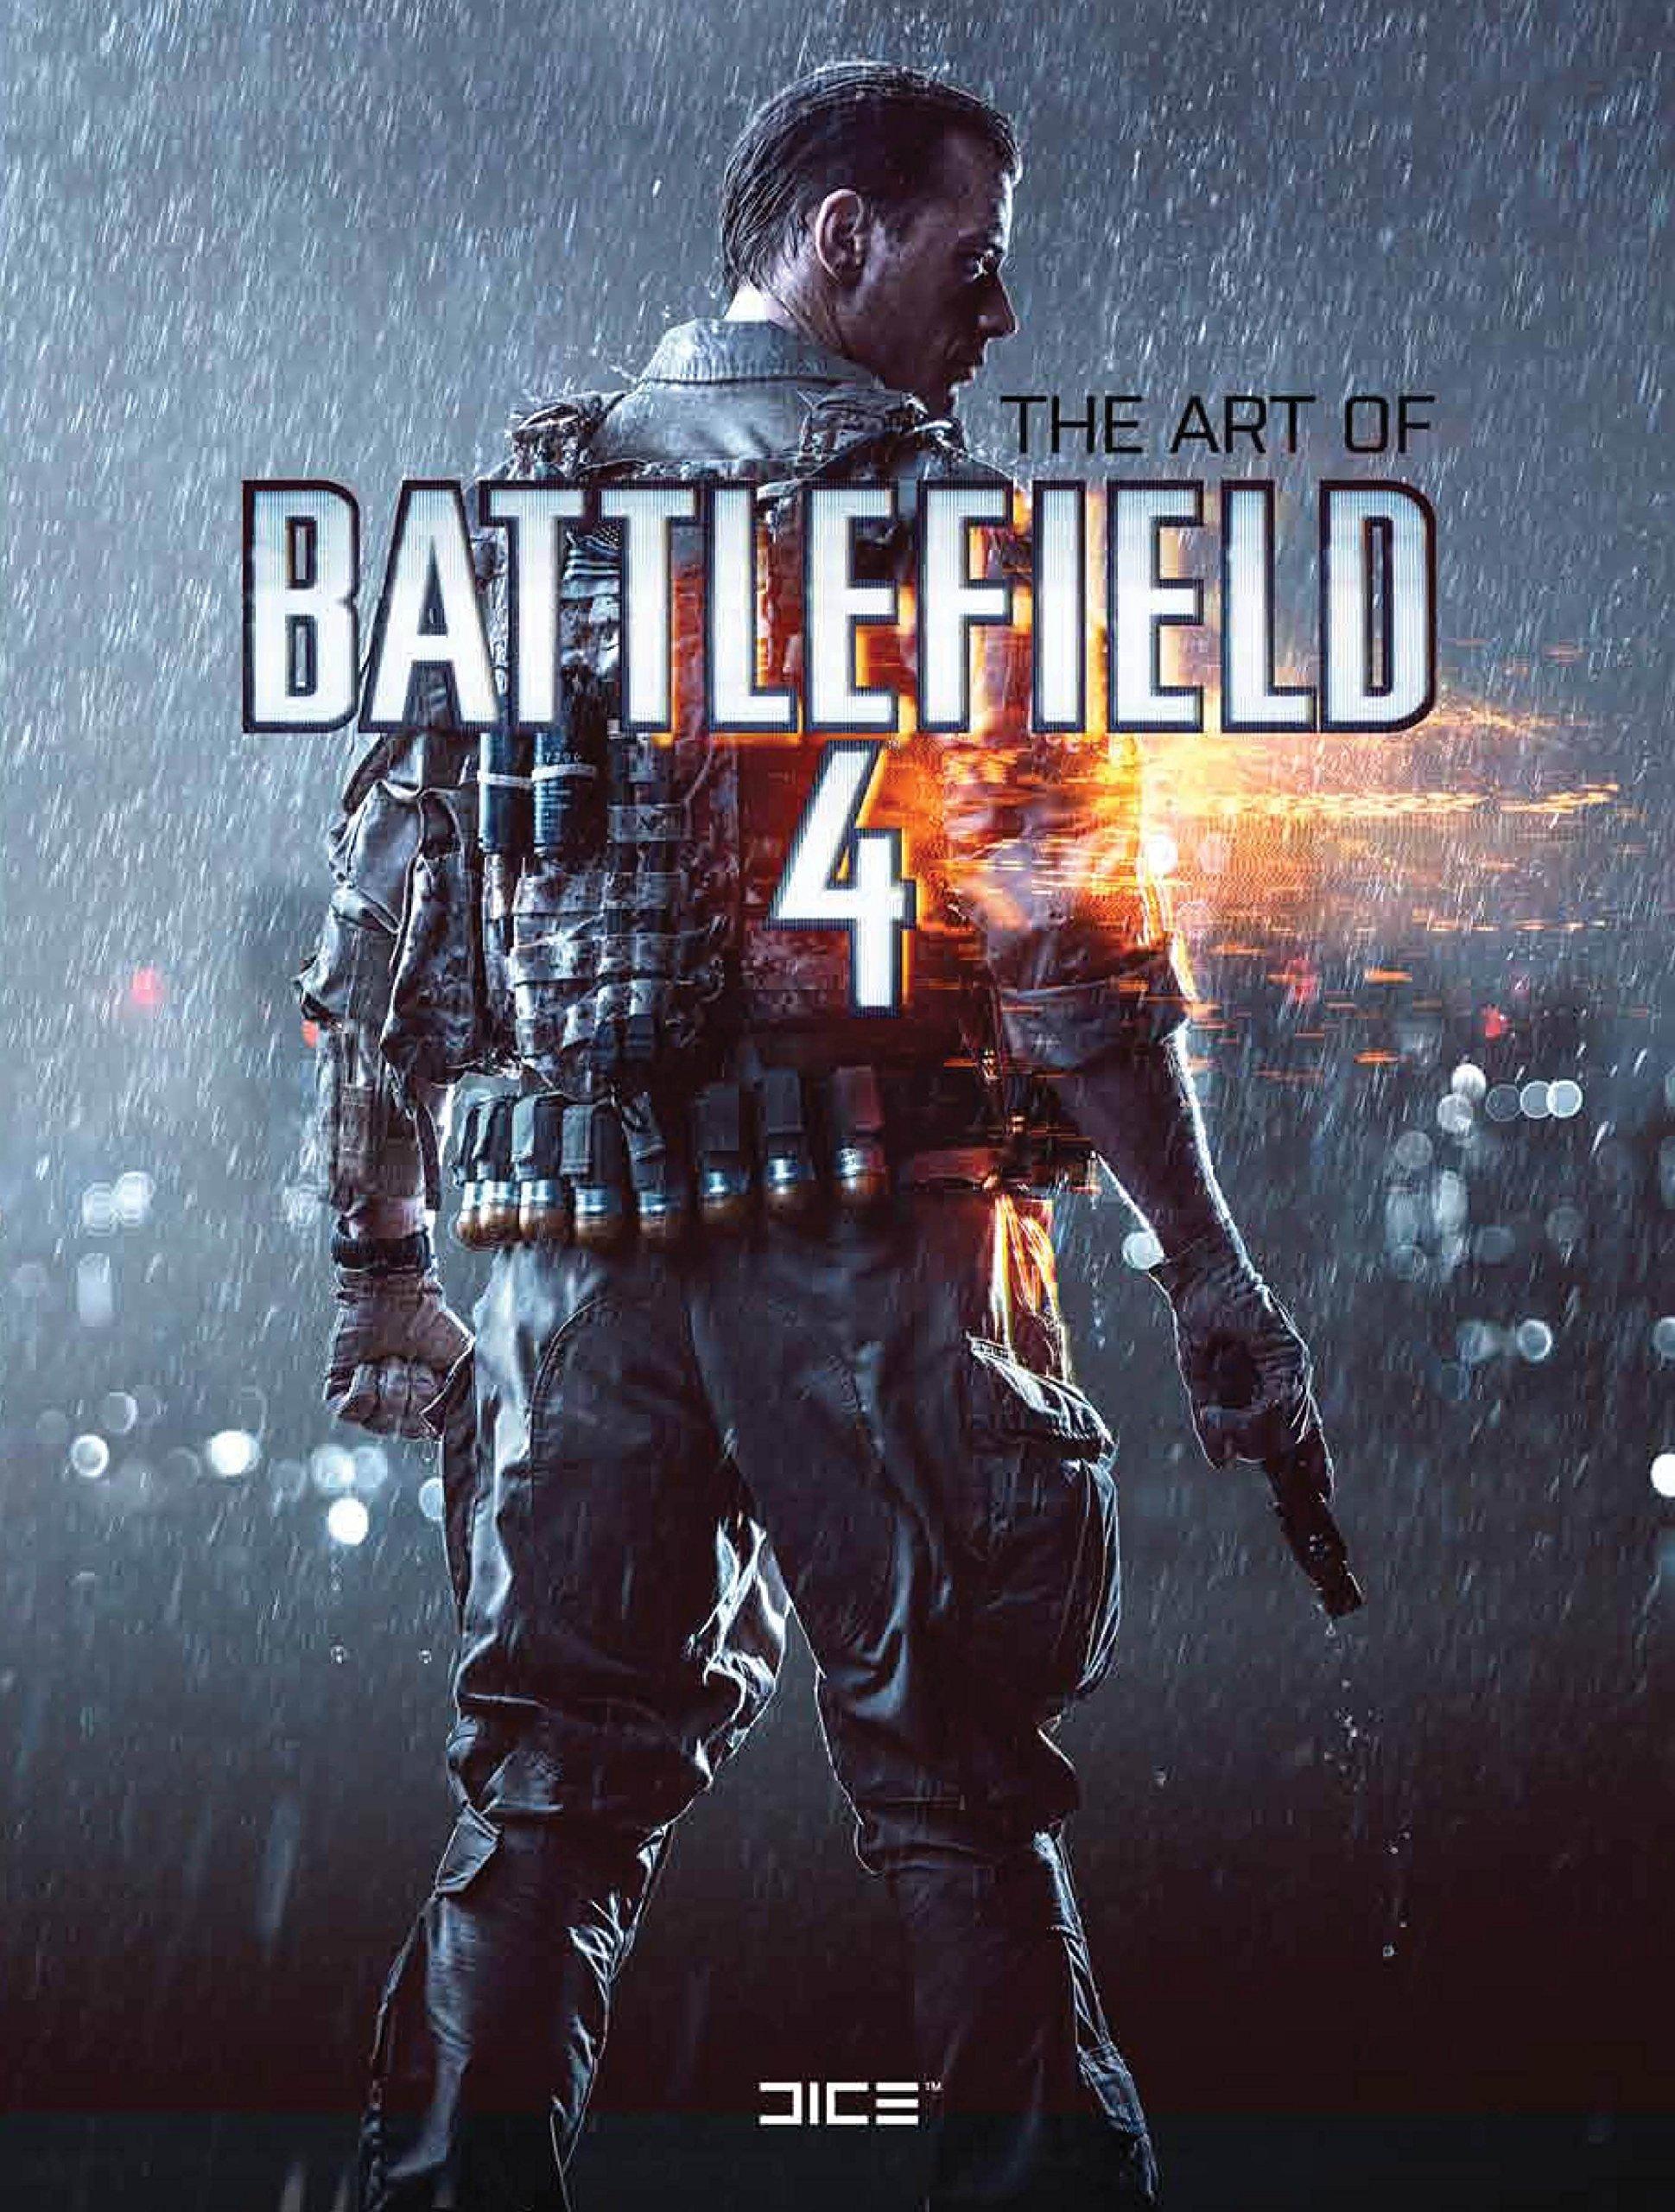 The Art of Battlefield 4 pdf